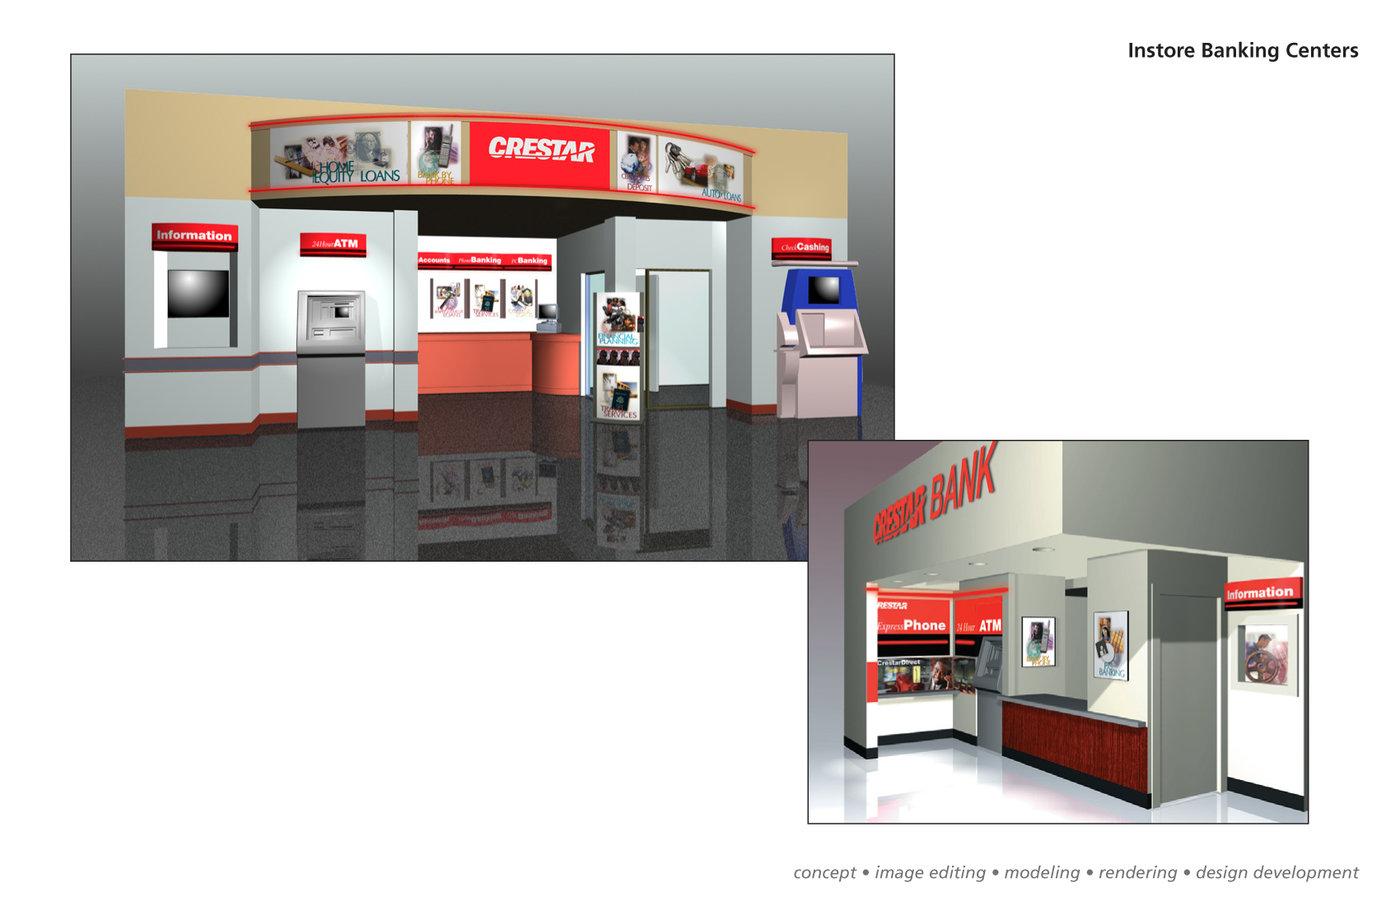 Instore-Remote Banking by Allan Amioka at Coroflot.com